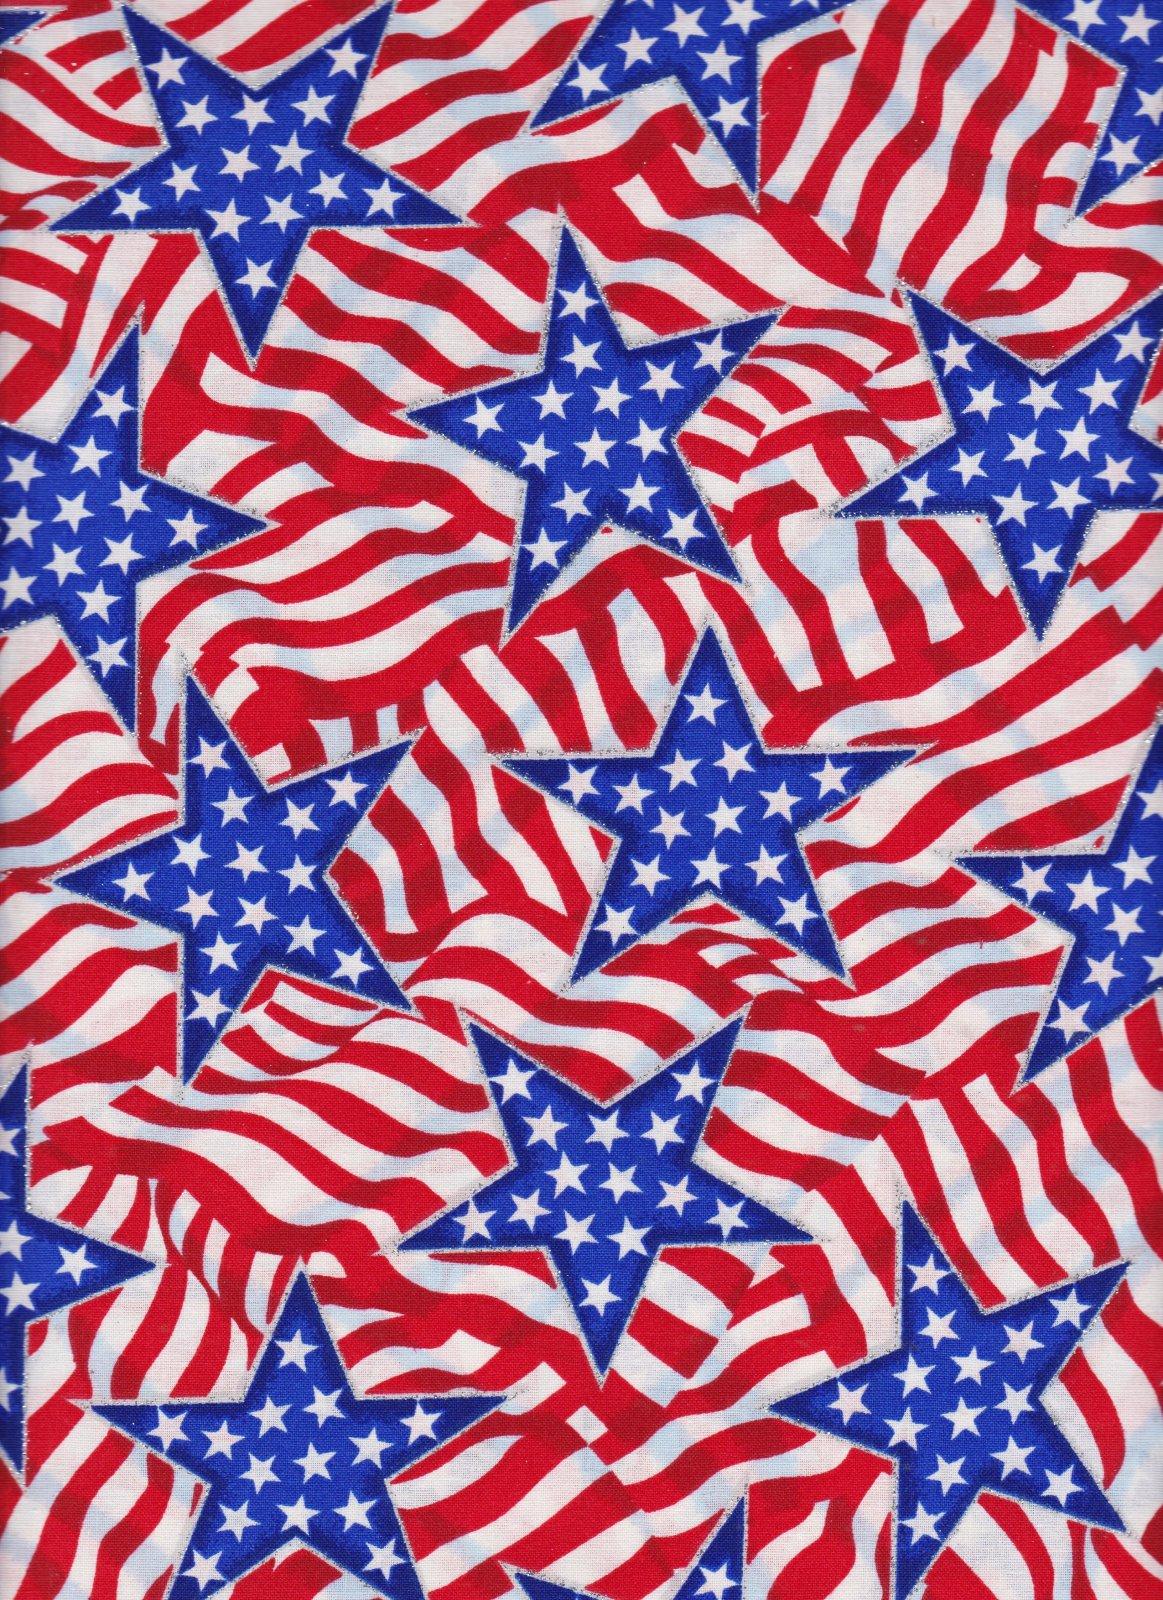 PROMO* FT-Patriotic Prints 16659 Pattern Stars & Stripes w/Glitter